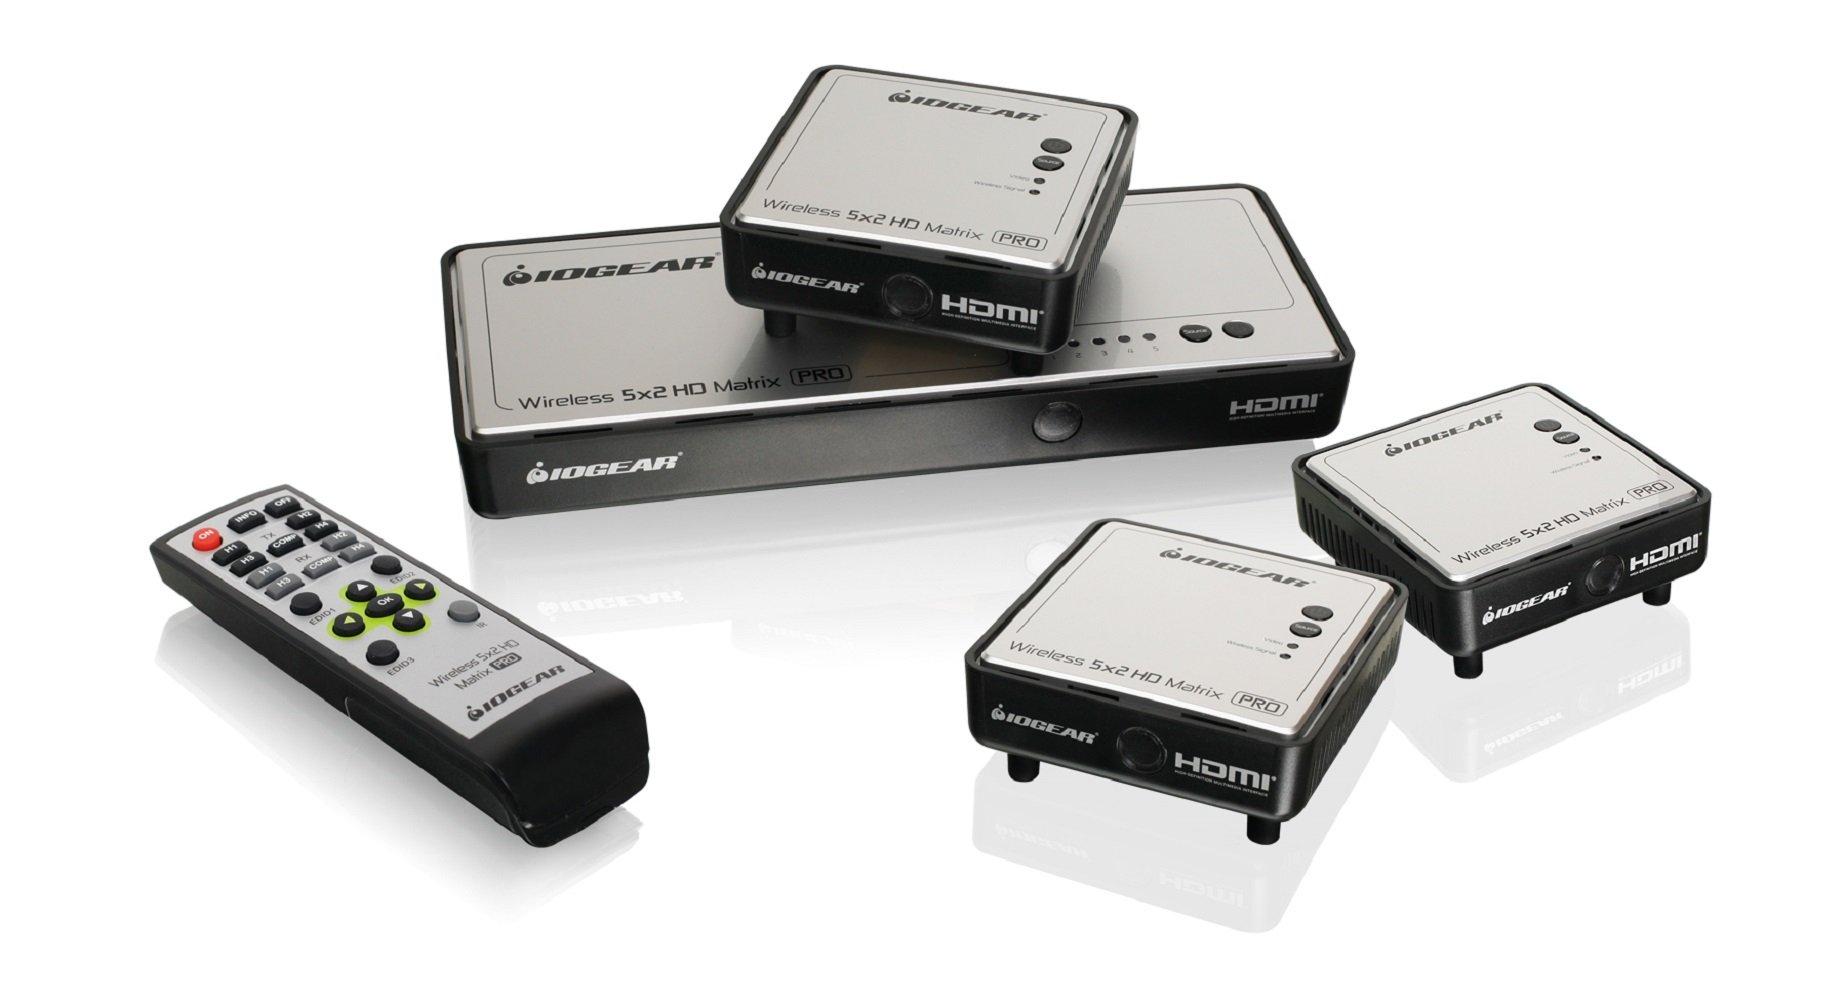 IOGEAR Long Range Wireless 5x2 HDMI Matrix PRO with 2 Additional Receivers, GWHDMS52MBK3 by IOGEAR